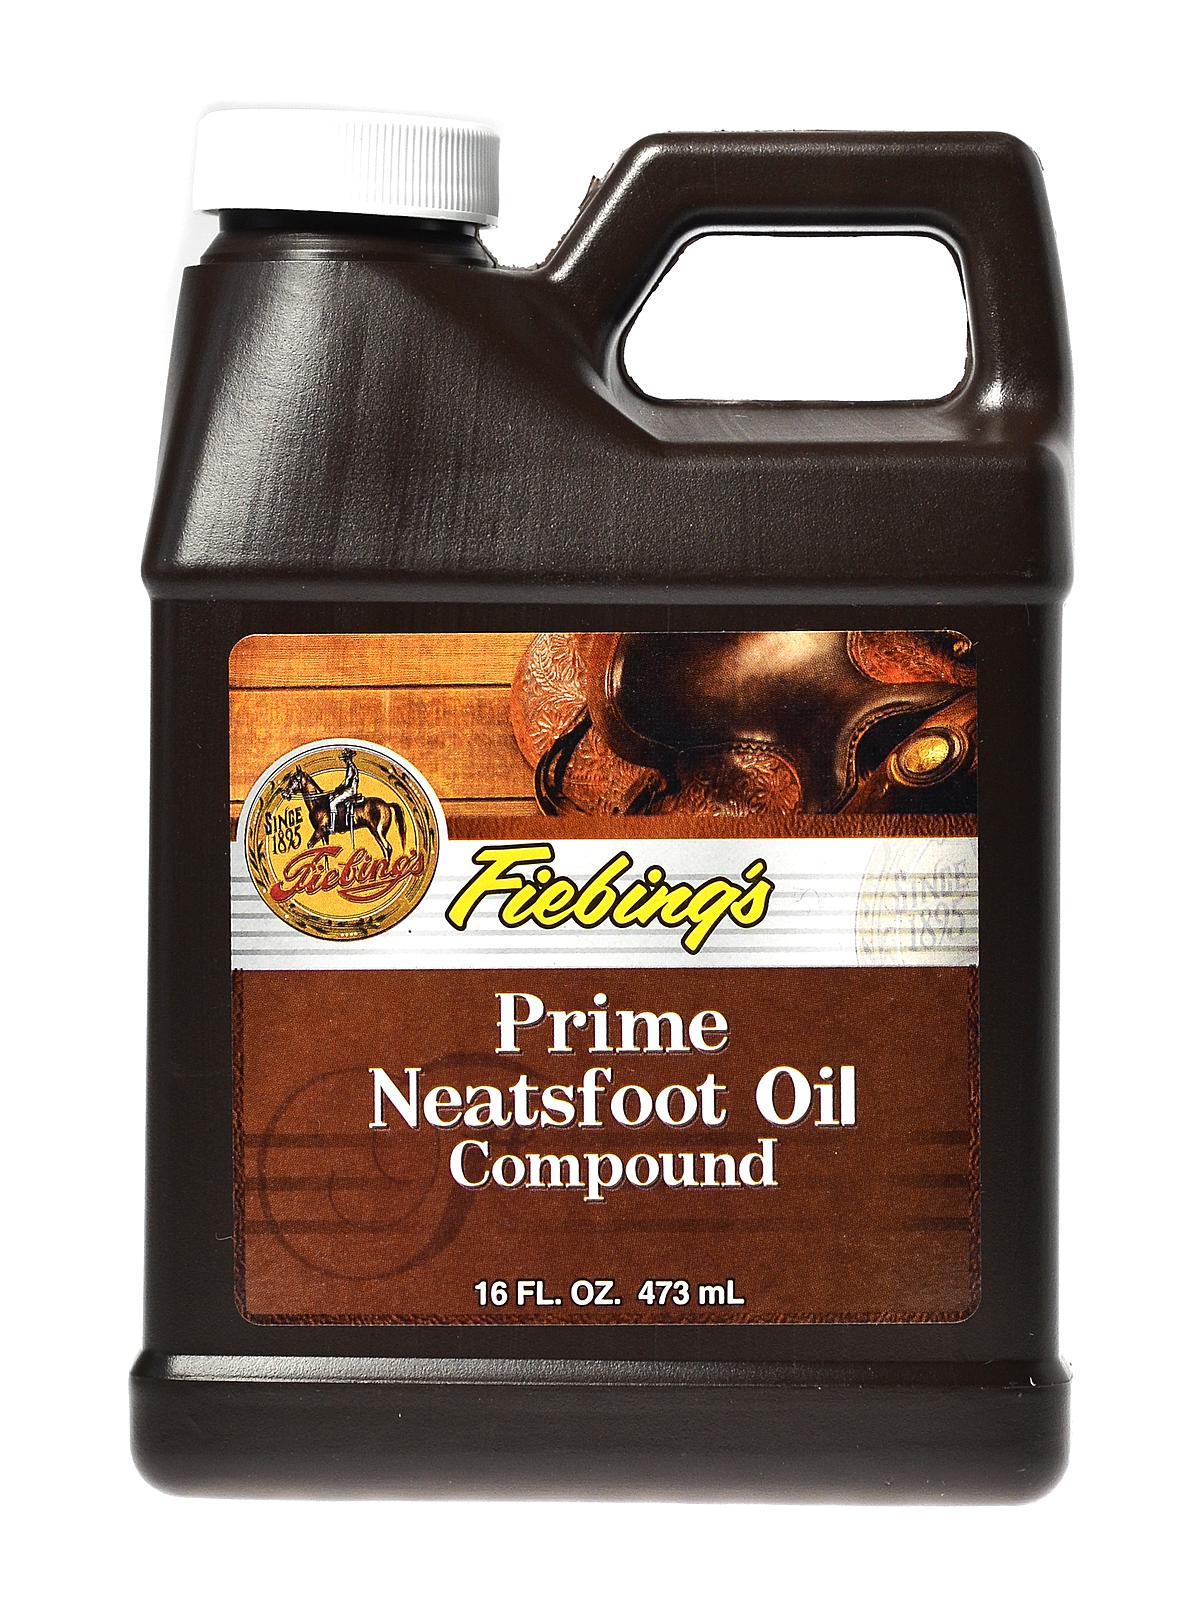 Fiebing's Prime Neatsfoot Oil